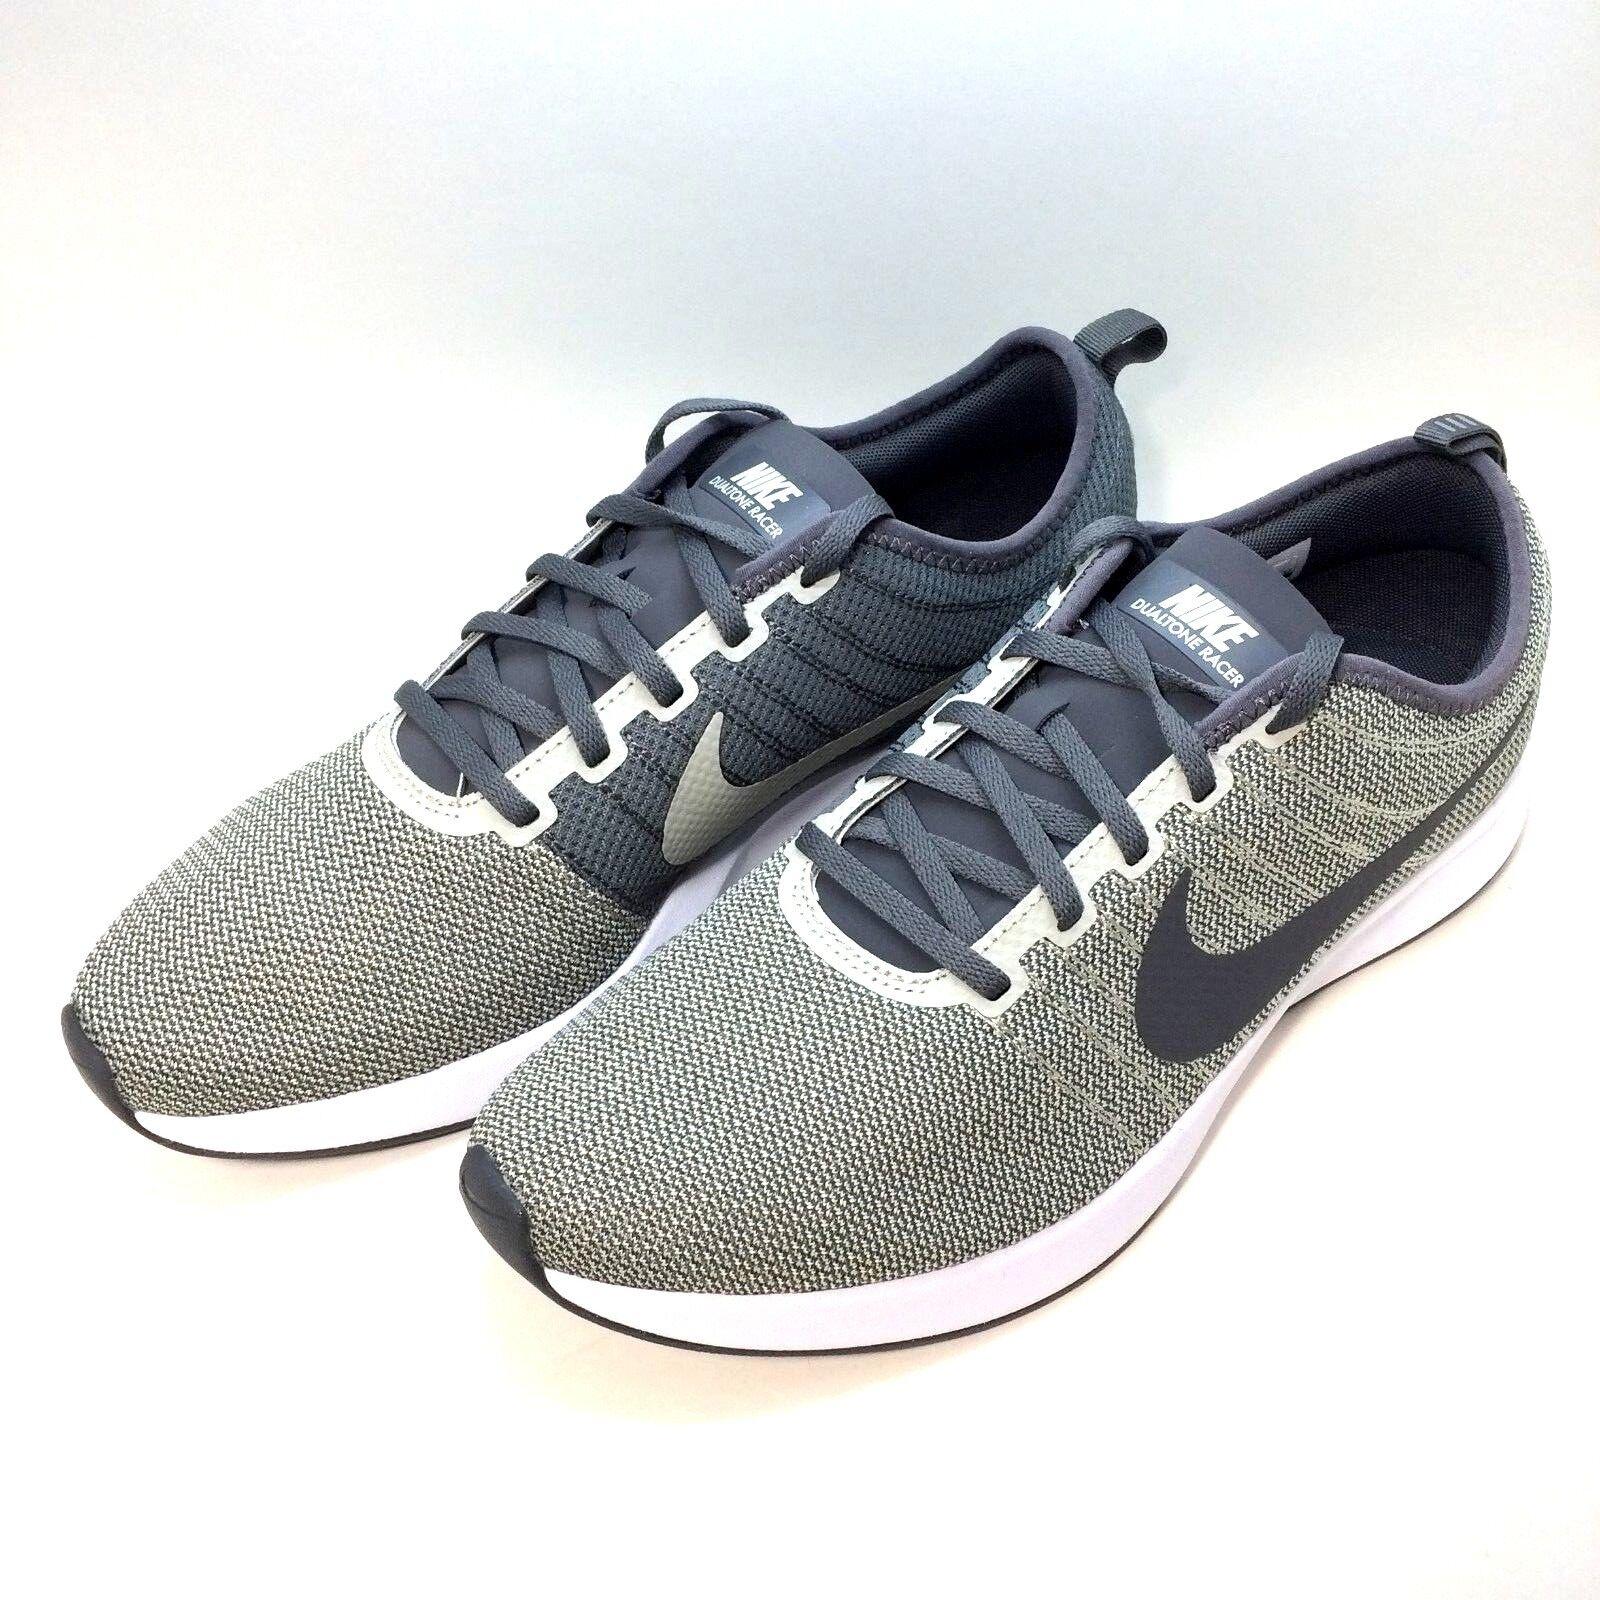 NEW Nike Dualtone Racer Men's Running shoes Sneakers 918227-003 Size 11